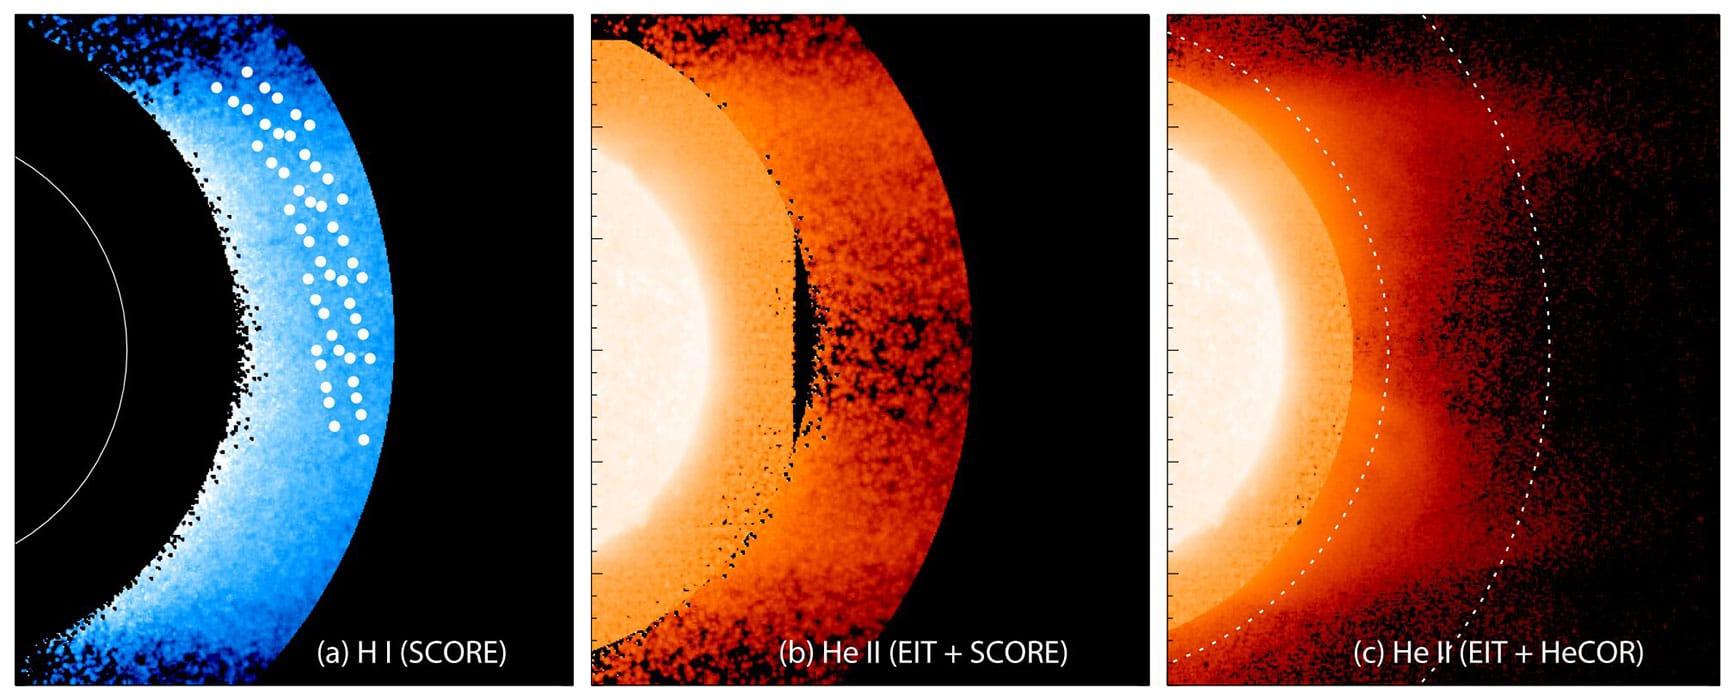 NASA sounding rocket discovered helium structures in the solar corona - Tech Explorist